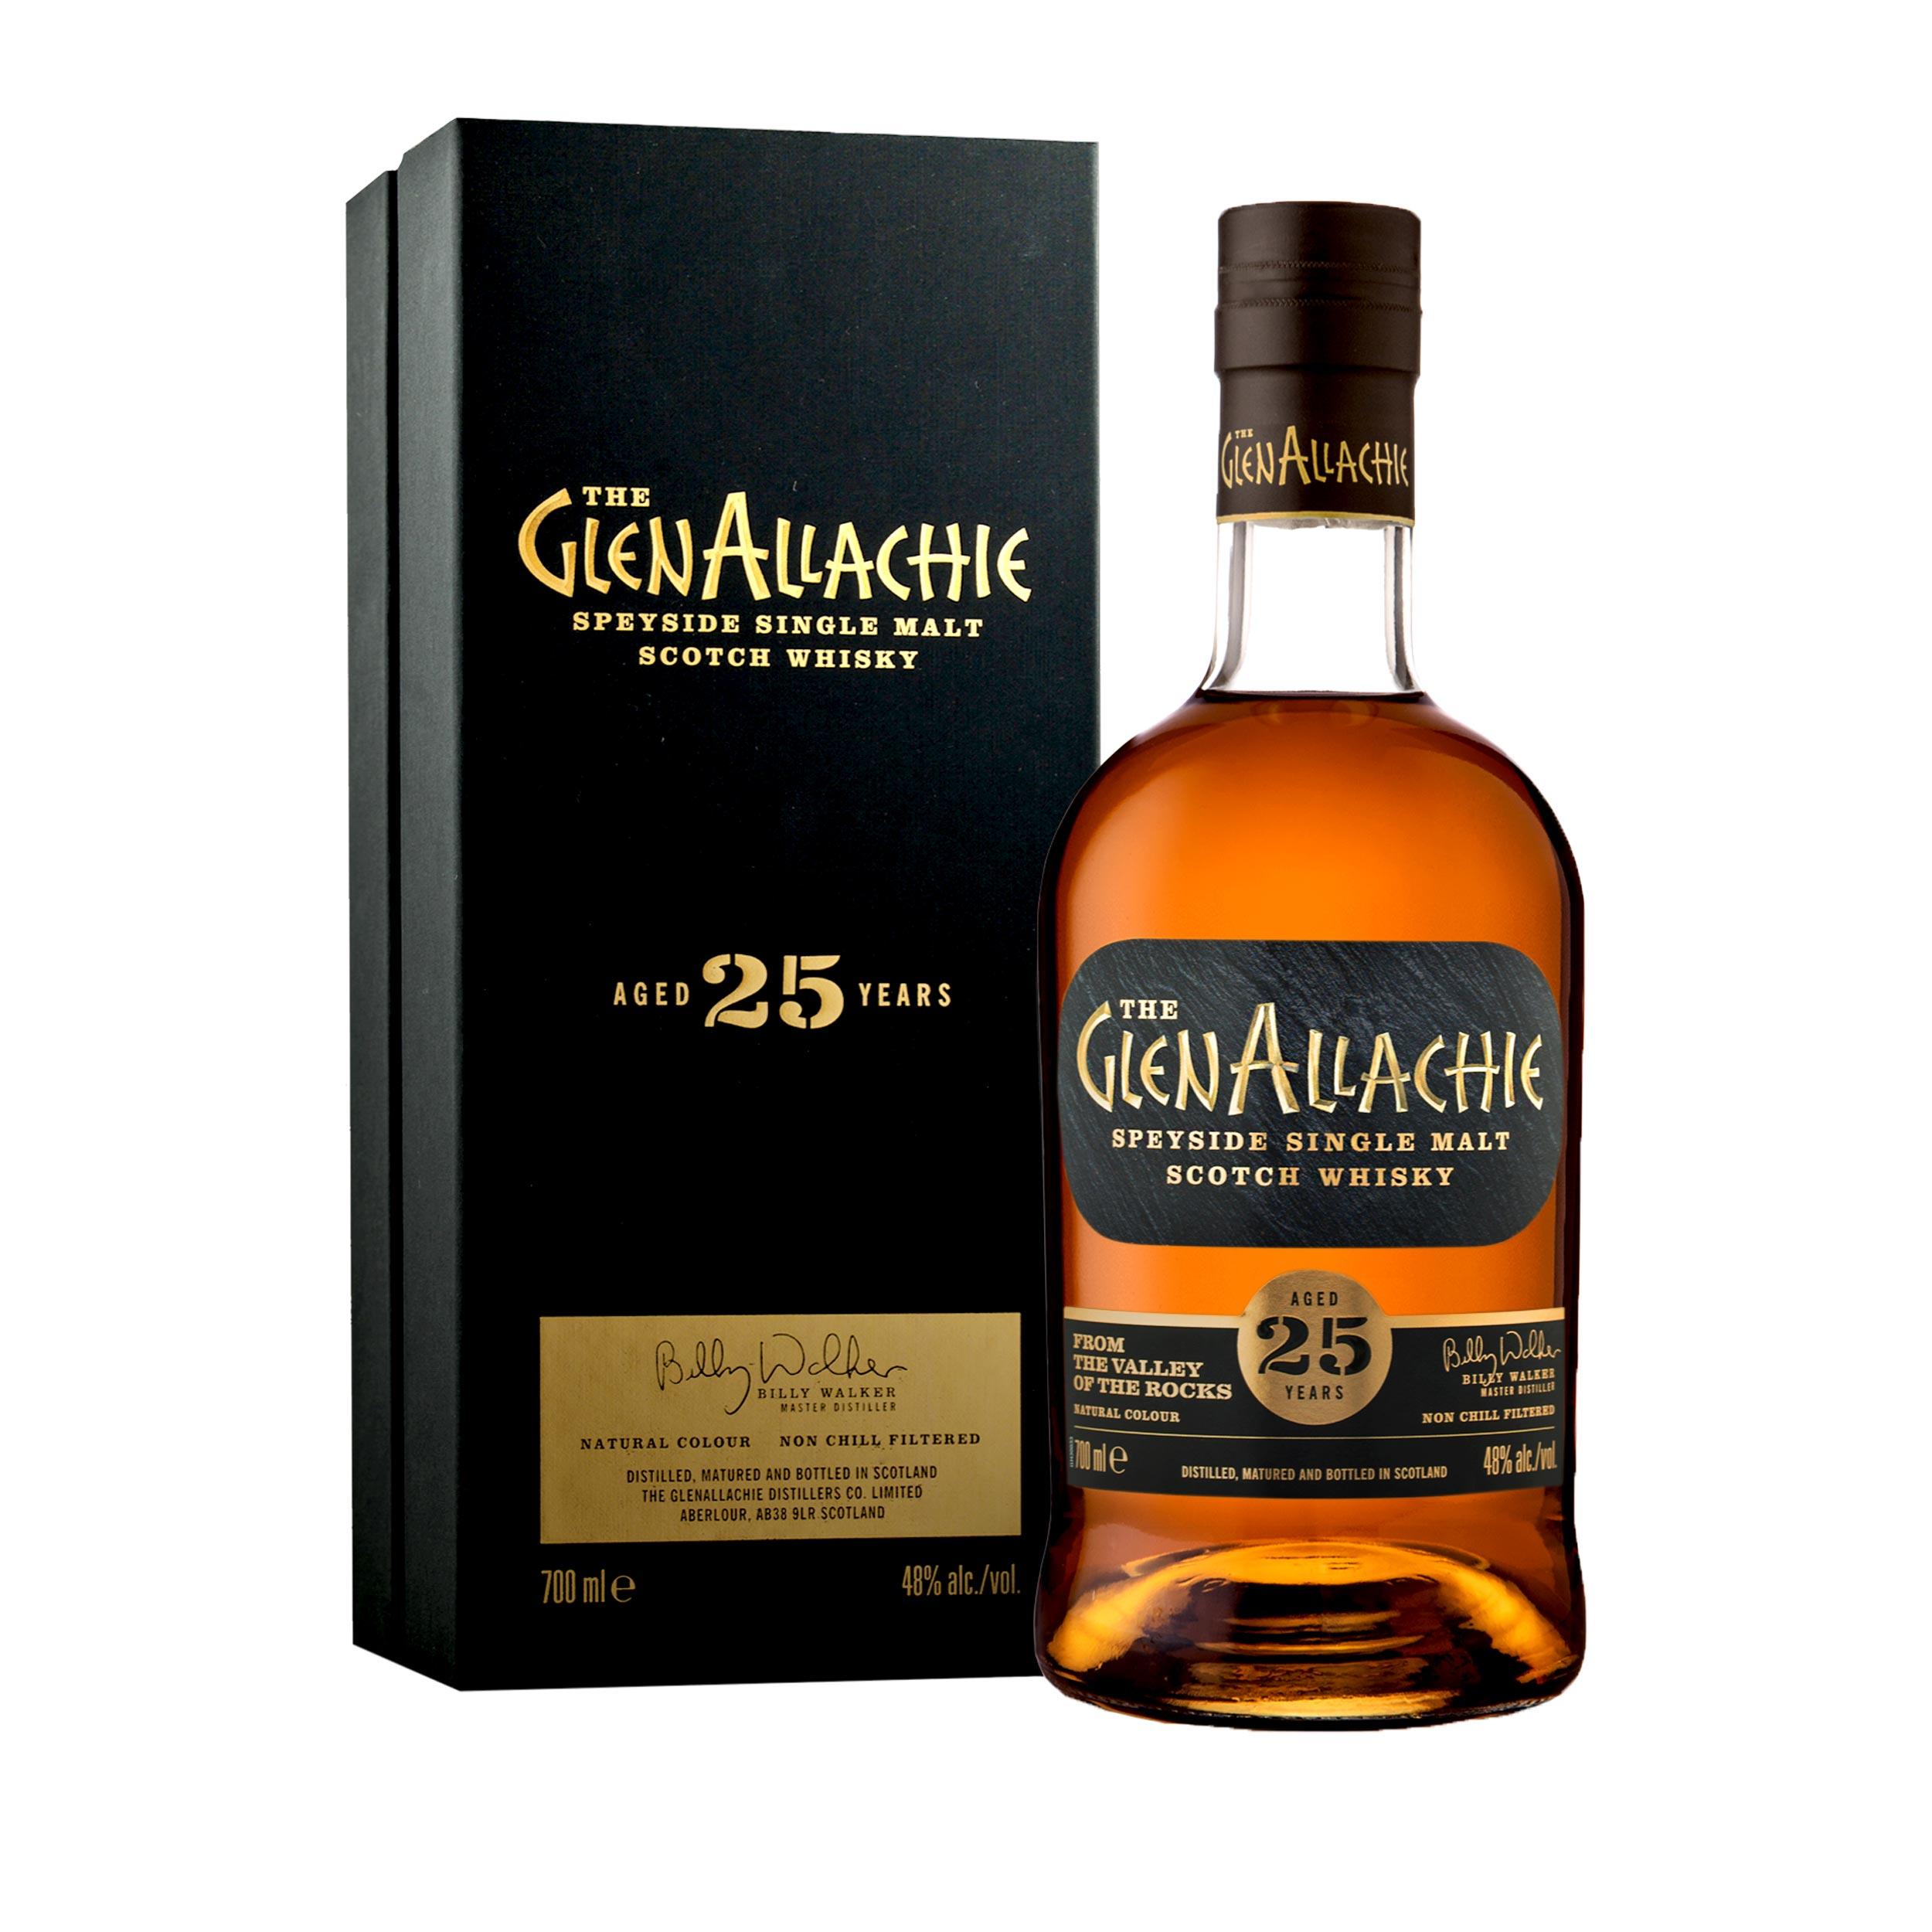 GlenAllachie 25 Year Old Limited Edition Speyside Single Malt Scotch Whisky 70cl